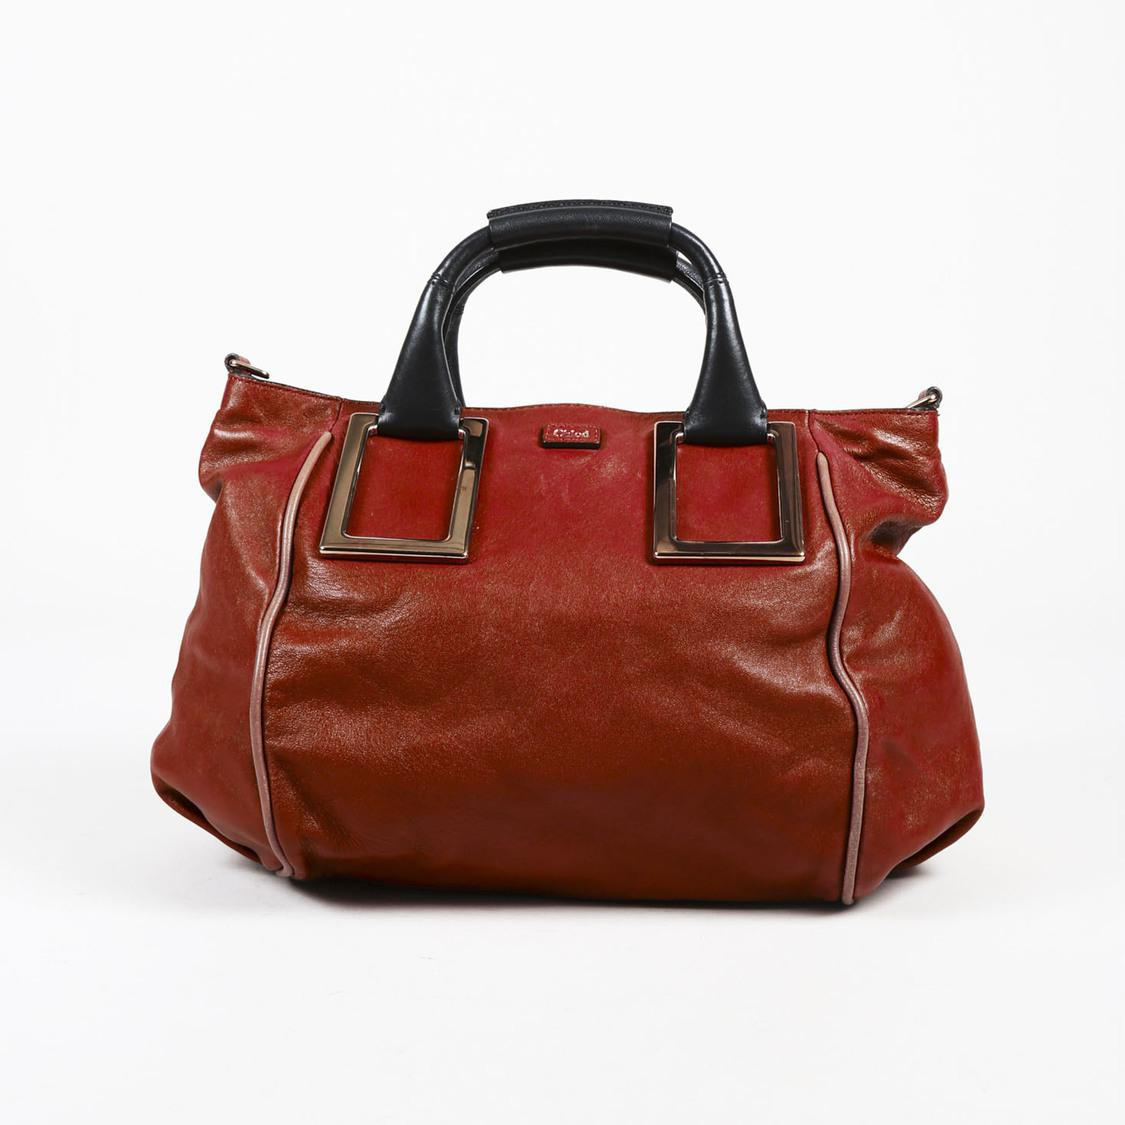 7c24db17b2 Chloé Brown Leather Top Handle Medium